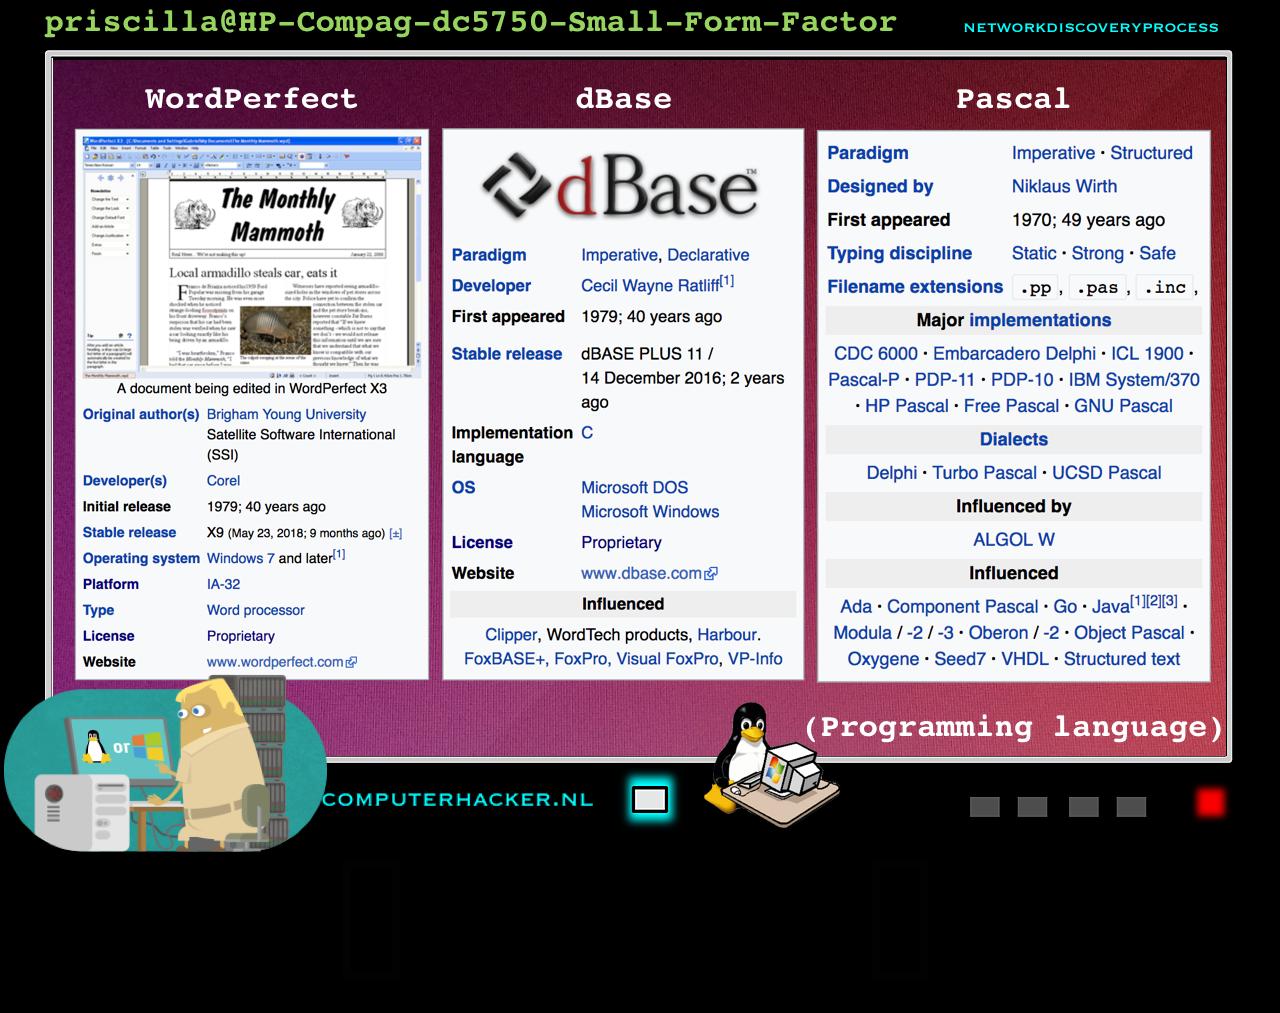 ubuntu/linux or gnu/linux if linux vs windows = 1  white hat